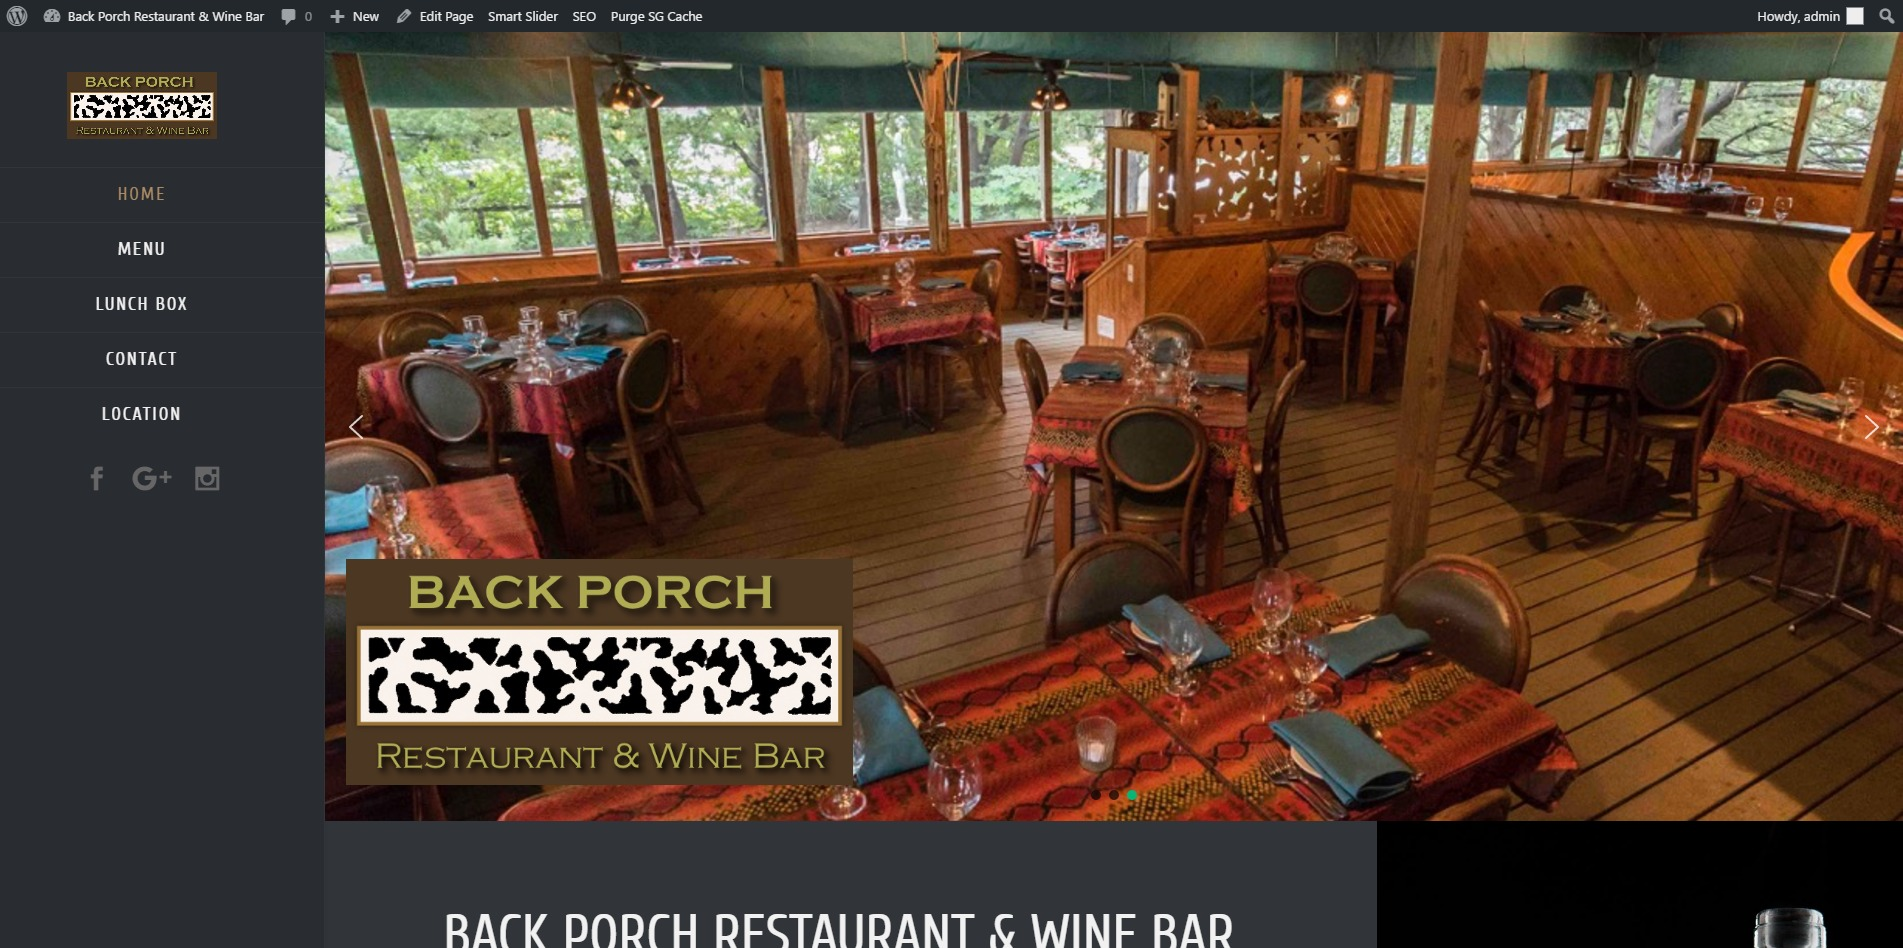 Back Porch Restaurant & Wine Bar - Ocracoke North Carolina